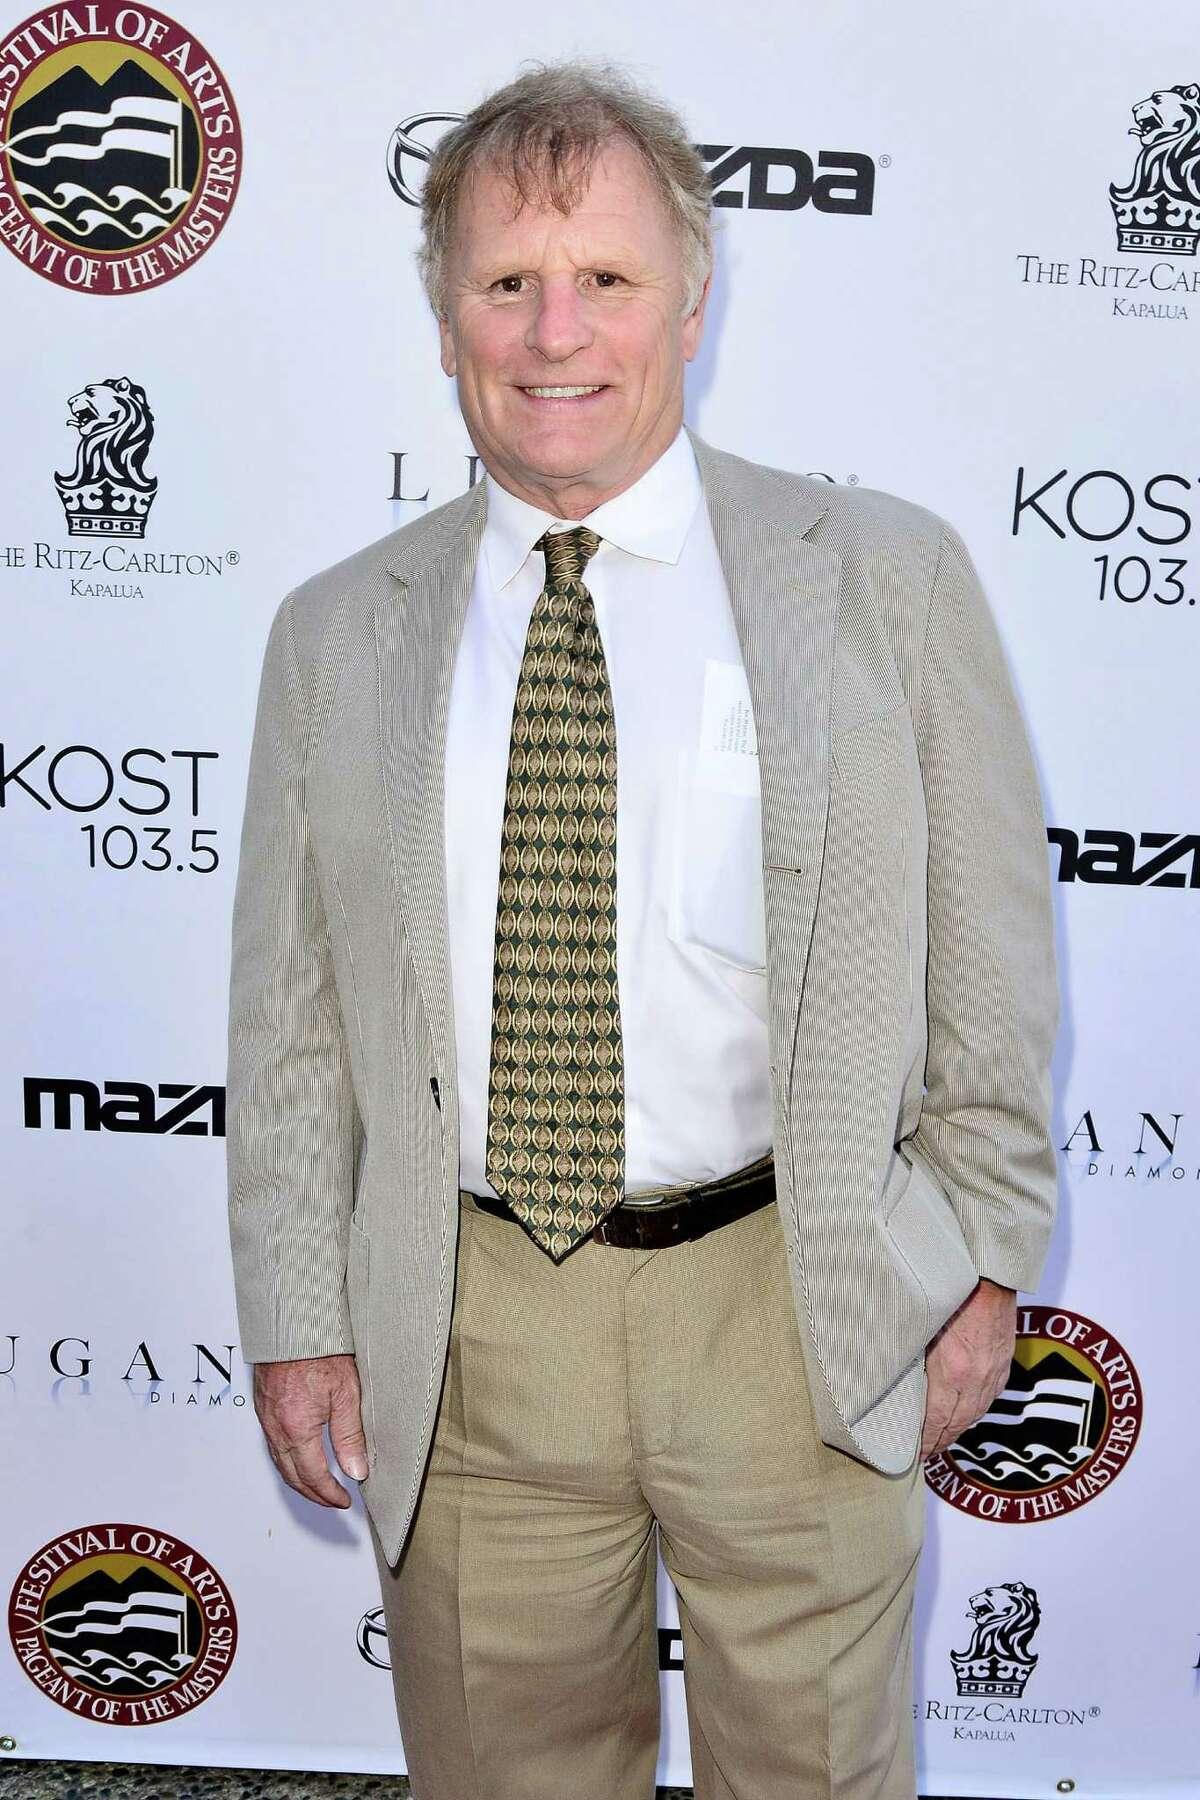 Actor Gordon Clapp (